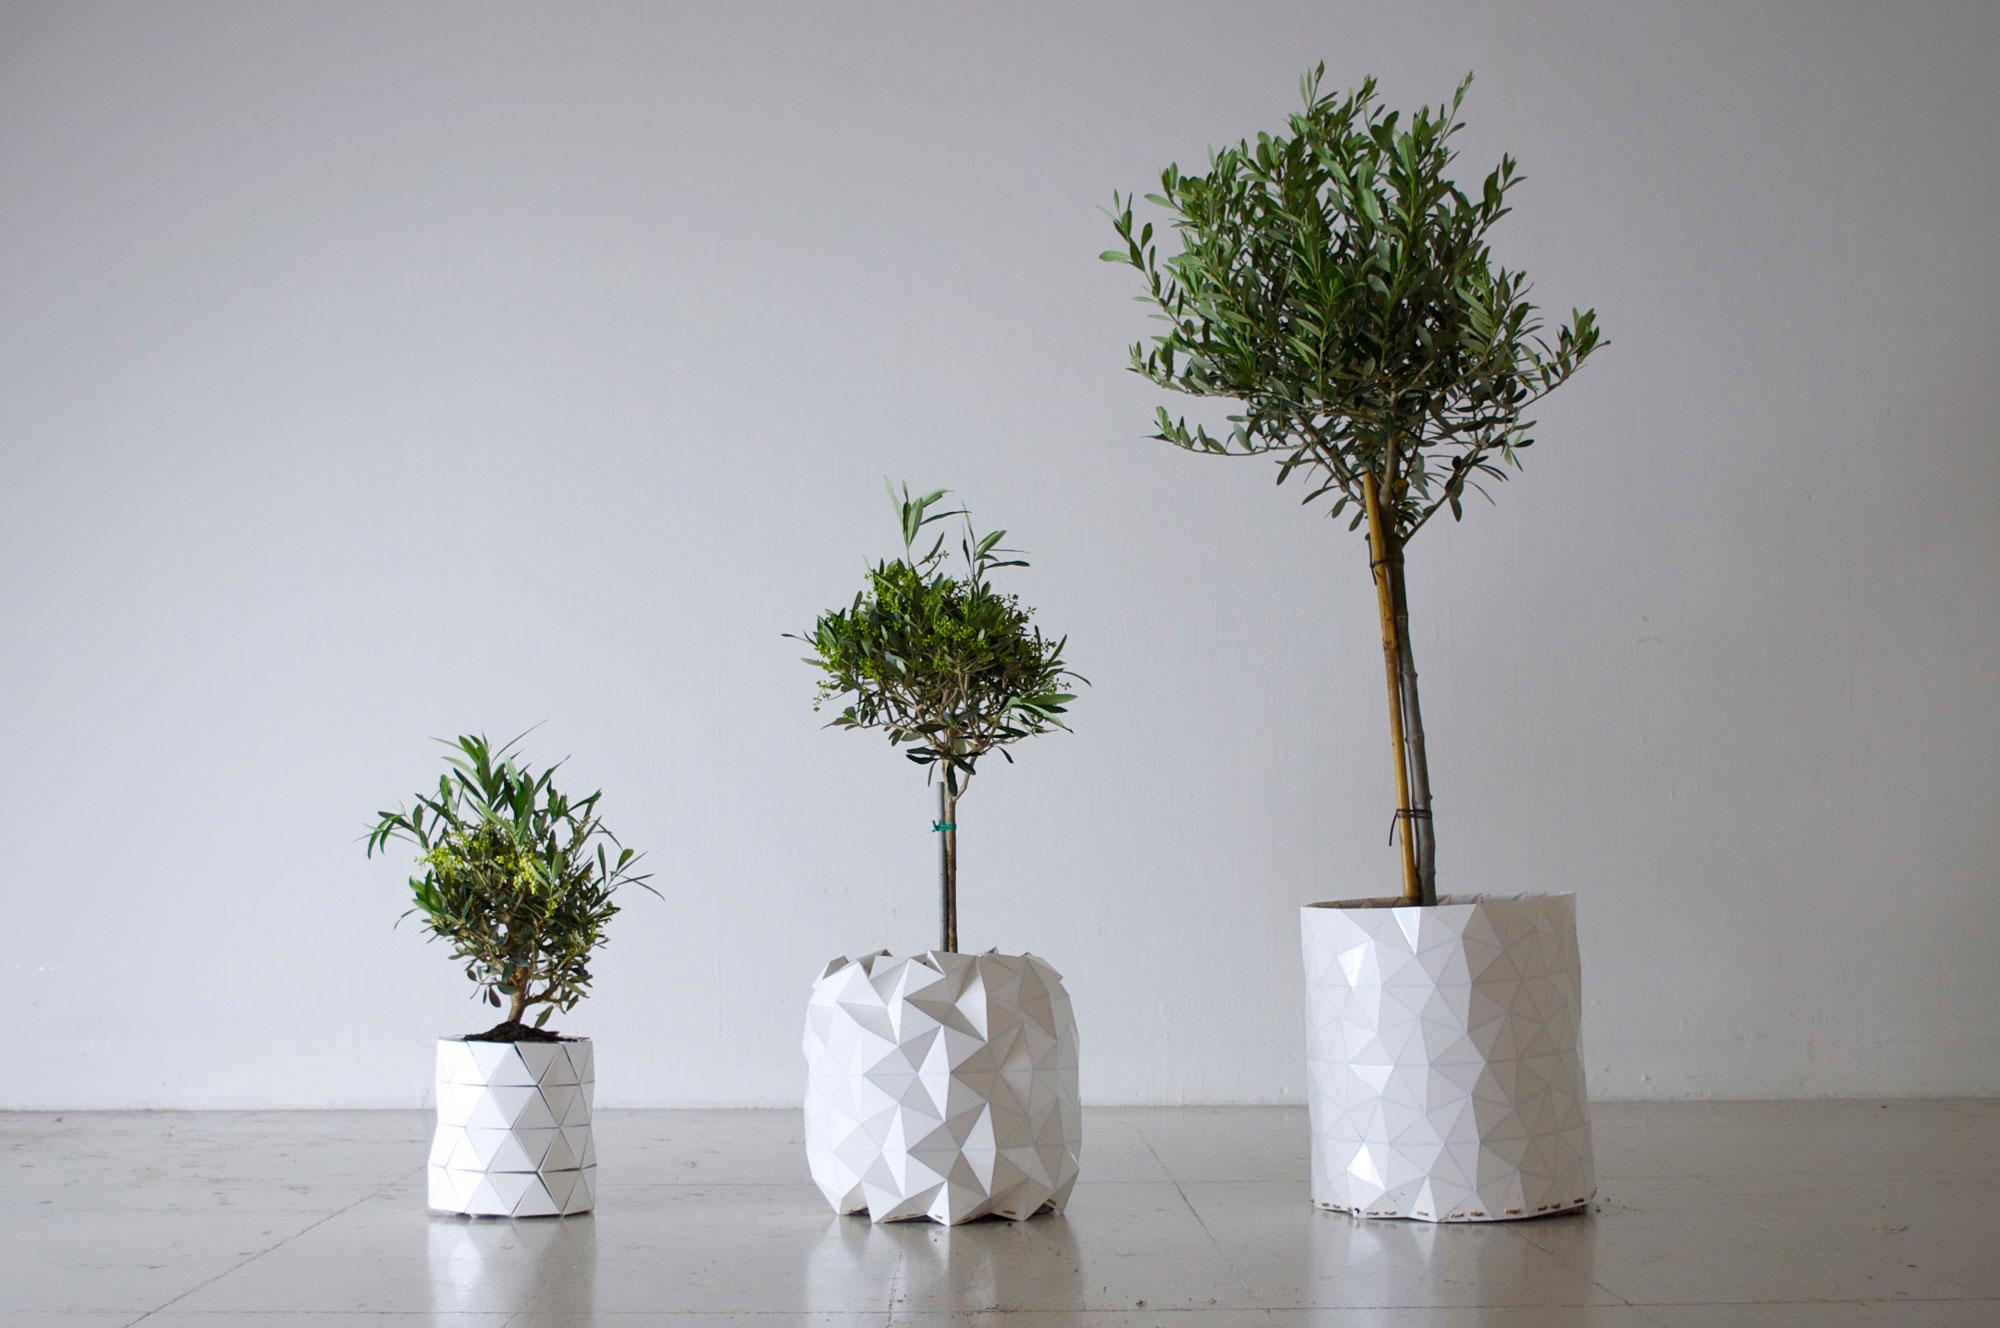 Studio-Ayaskan-Growth-Origami-Planter6